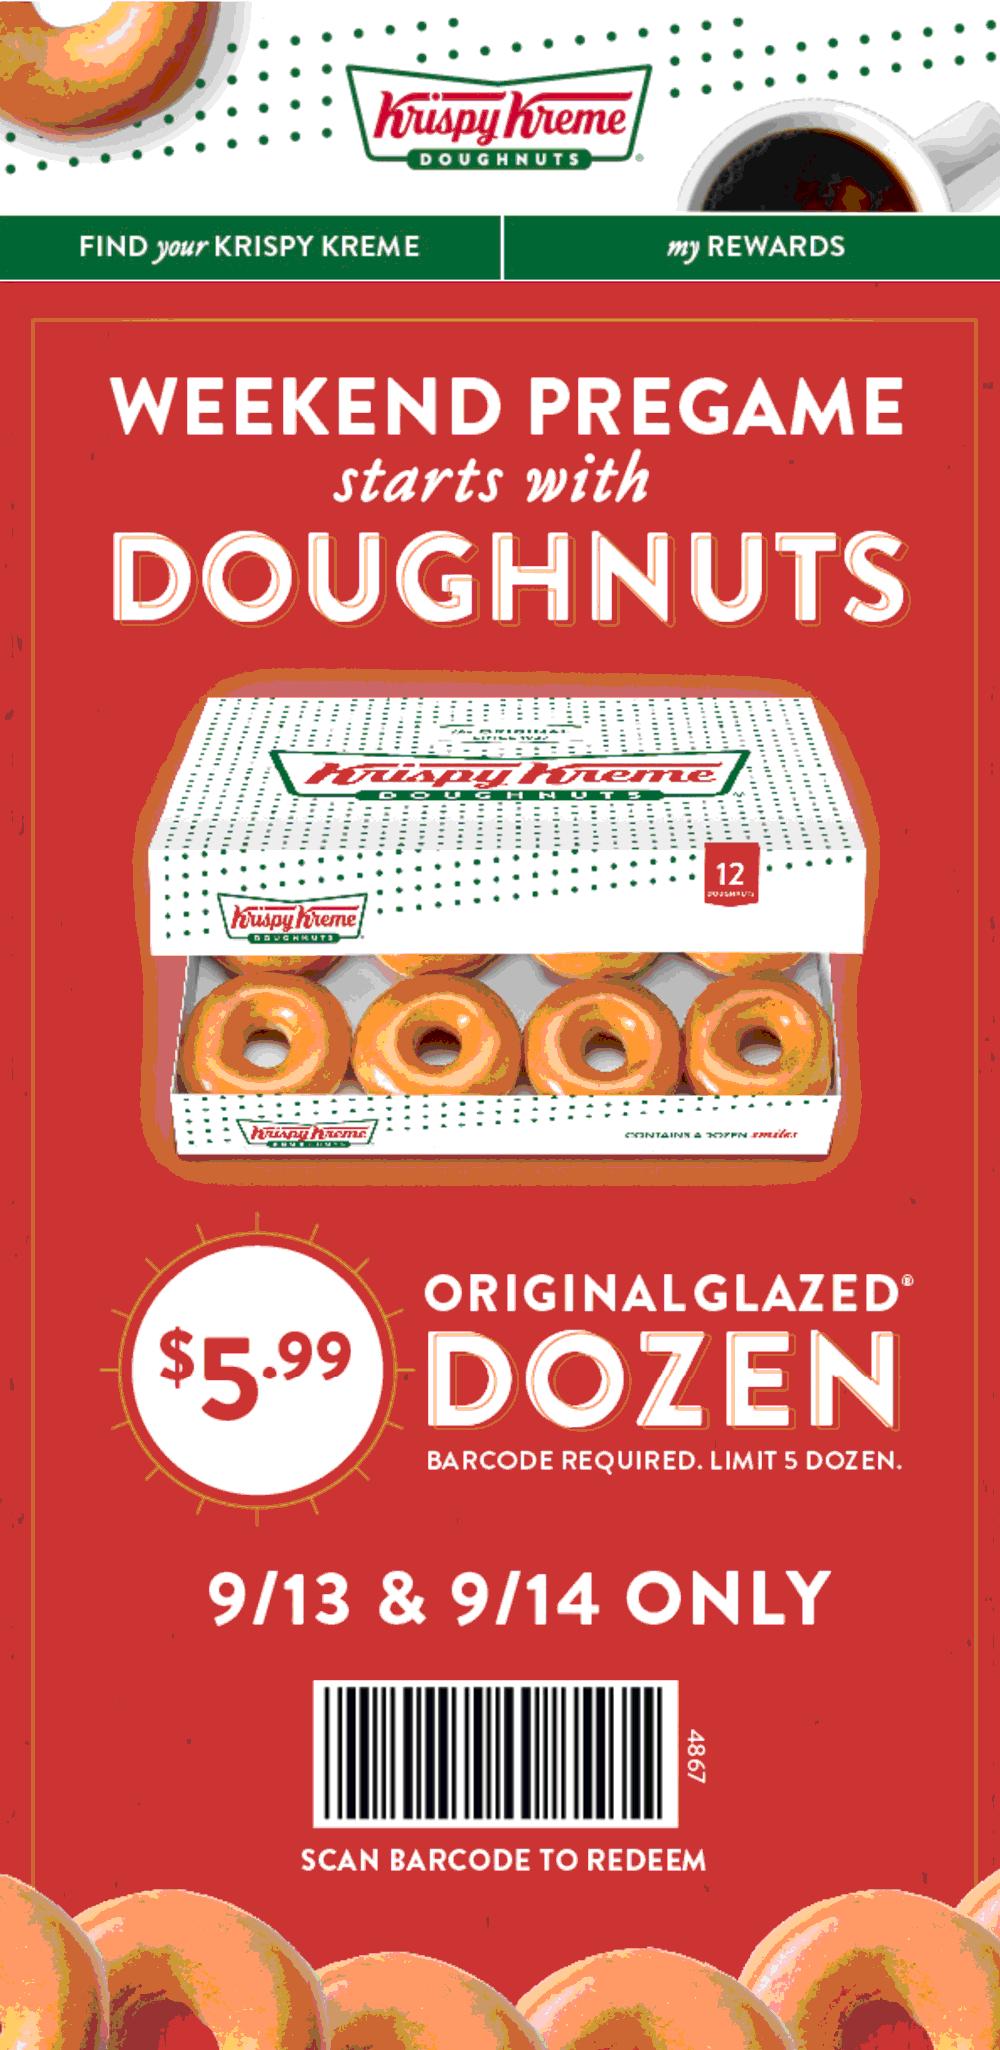 Krispy Kreme Coupon June 2020 $6 dozen at Krispy Kreme doughnuts